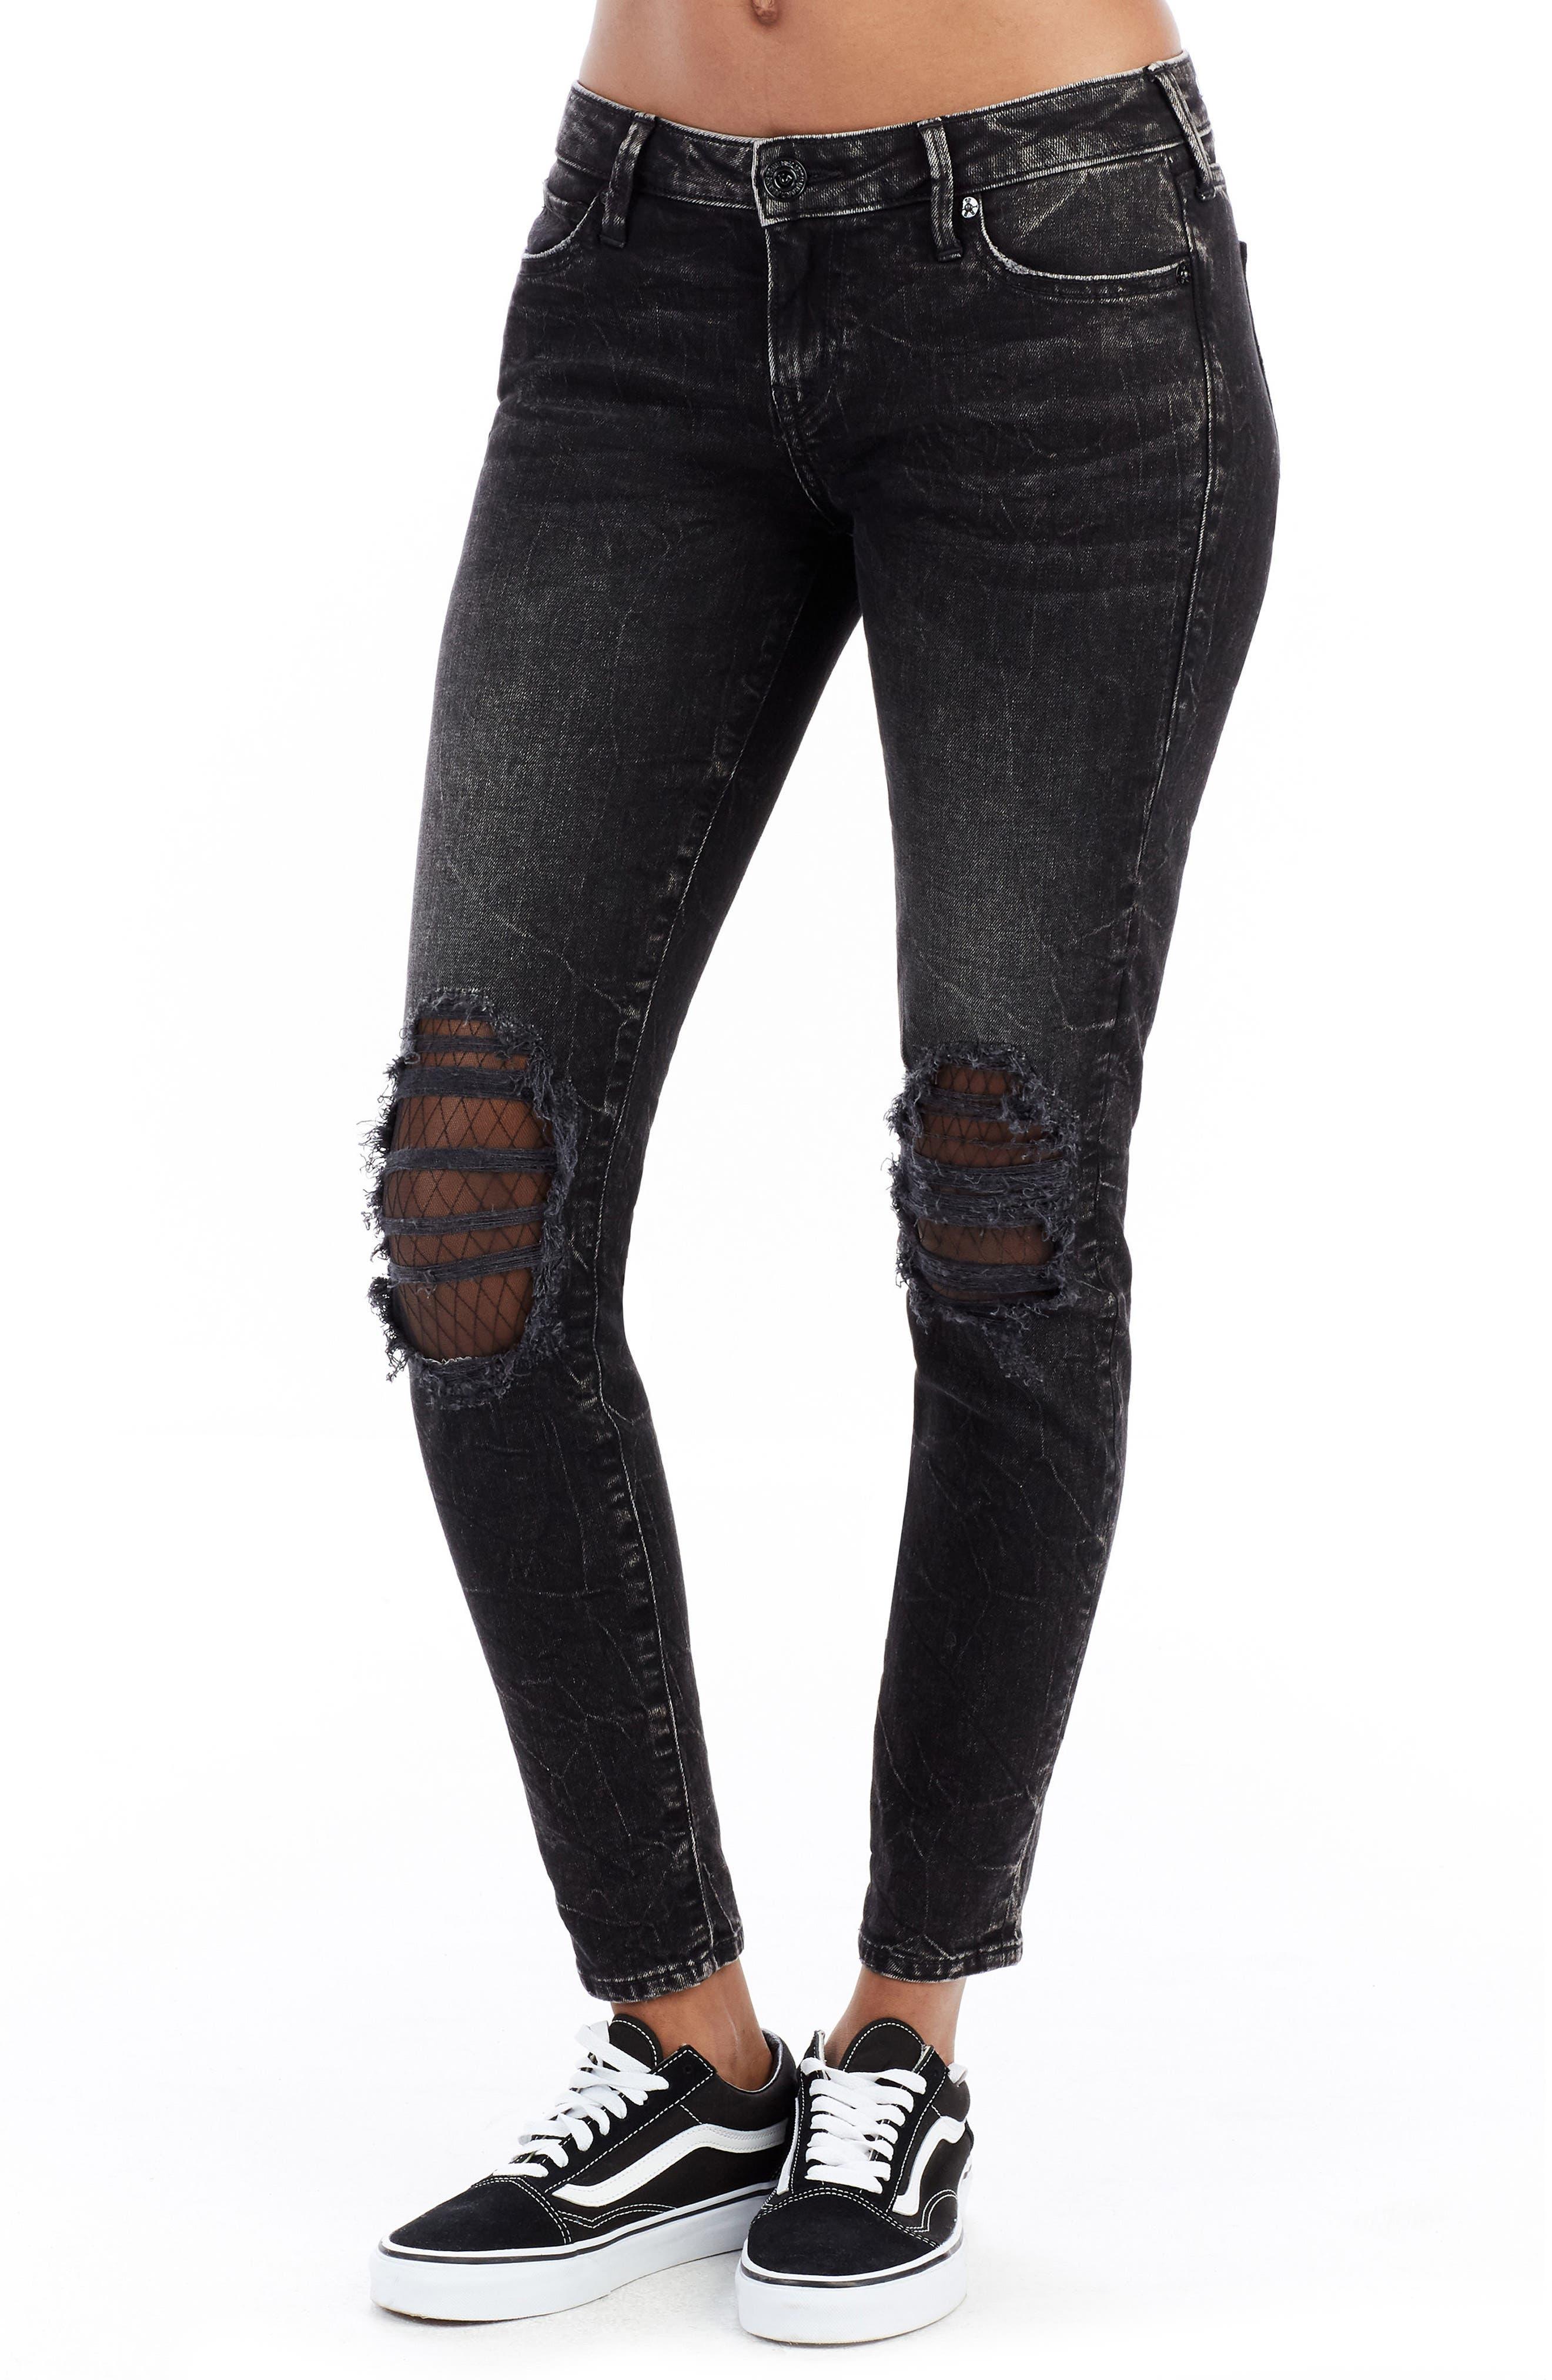 True Religion Brand Jeans Halle Ankle Skinny Jeans (Raven Fever)